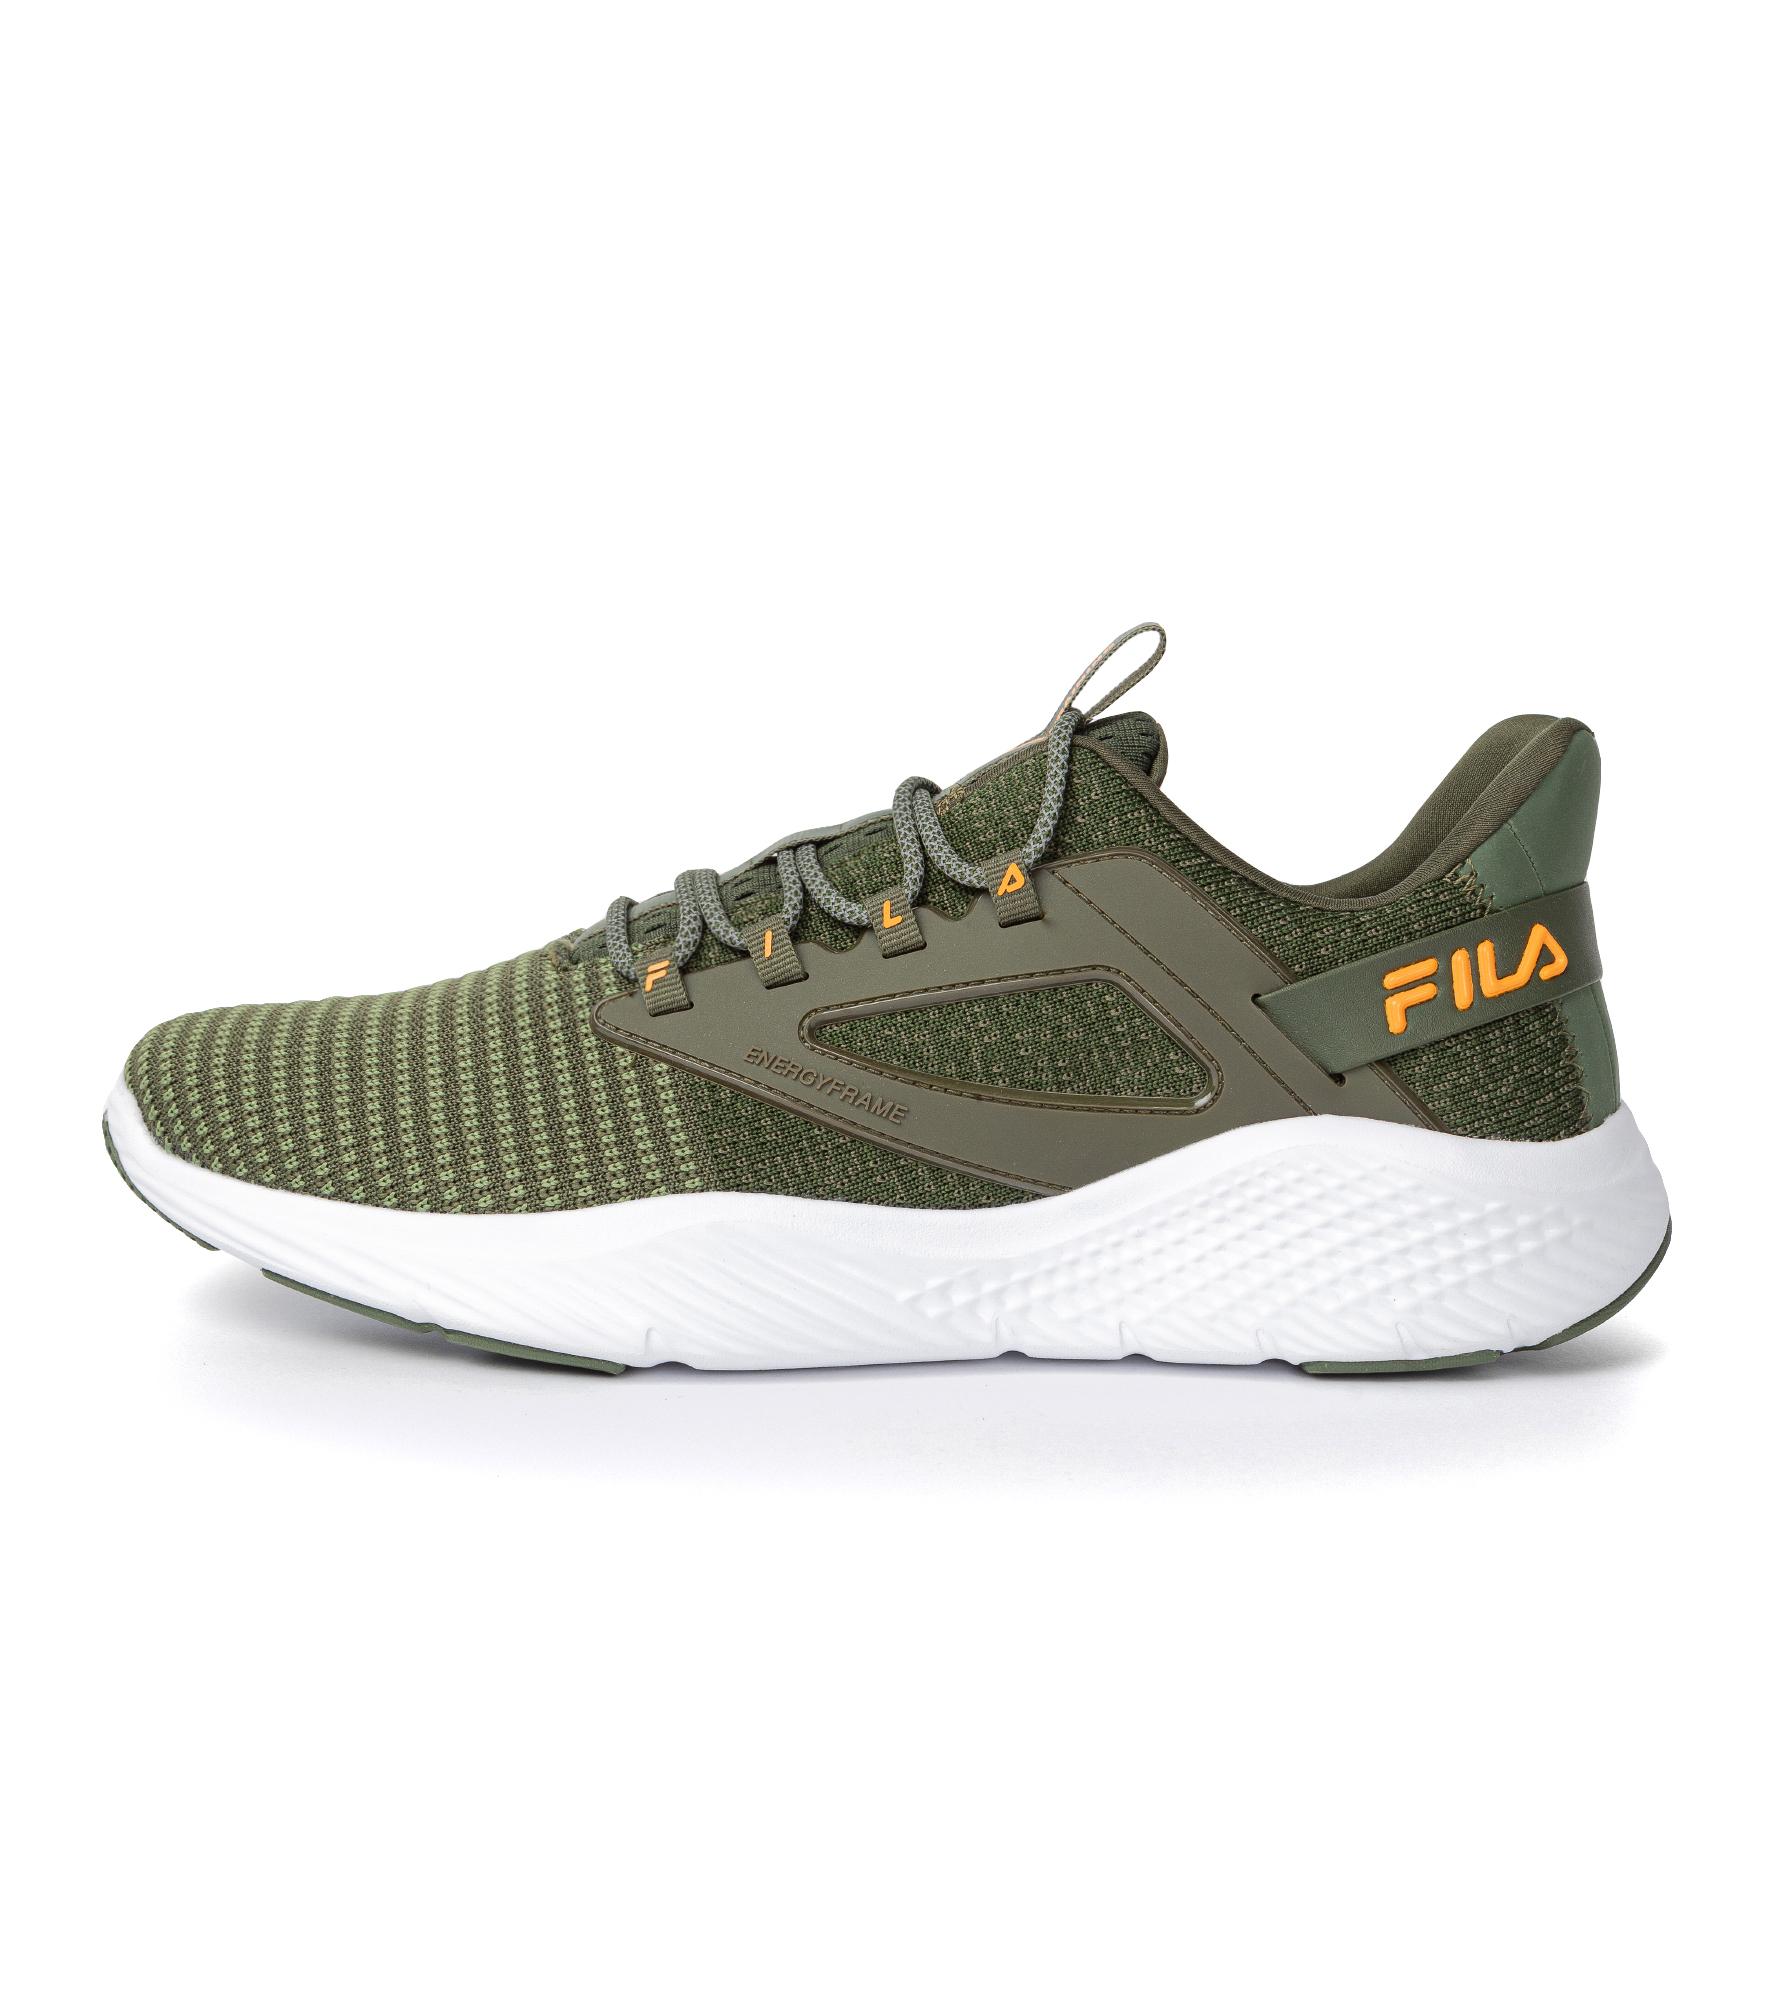 Fila Кроссовки мужские Fila FLASHBACK 2.0, размер 46 fila кроссовки мужские fila walkway low 3 0 размер 46